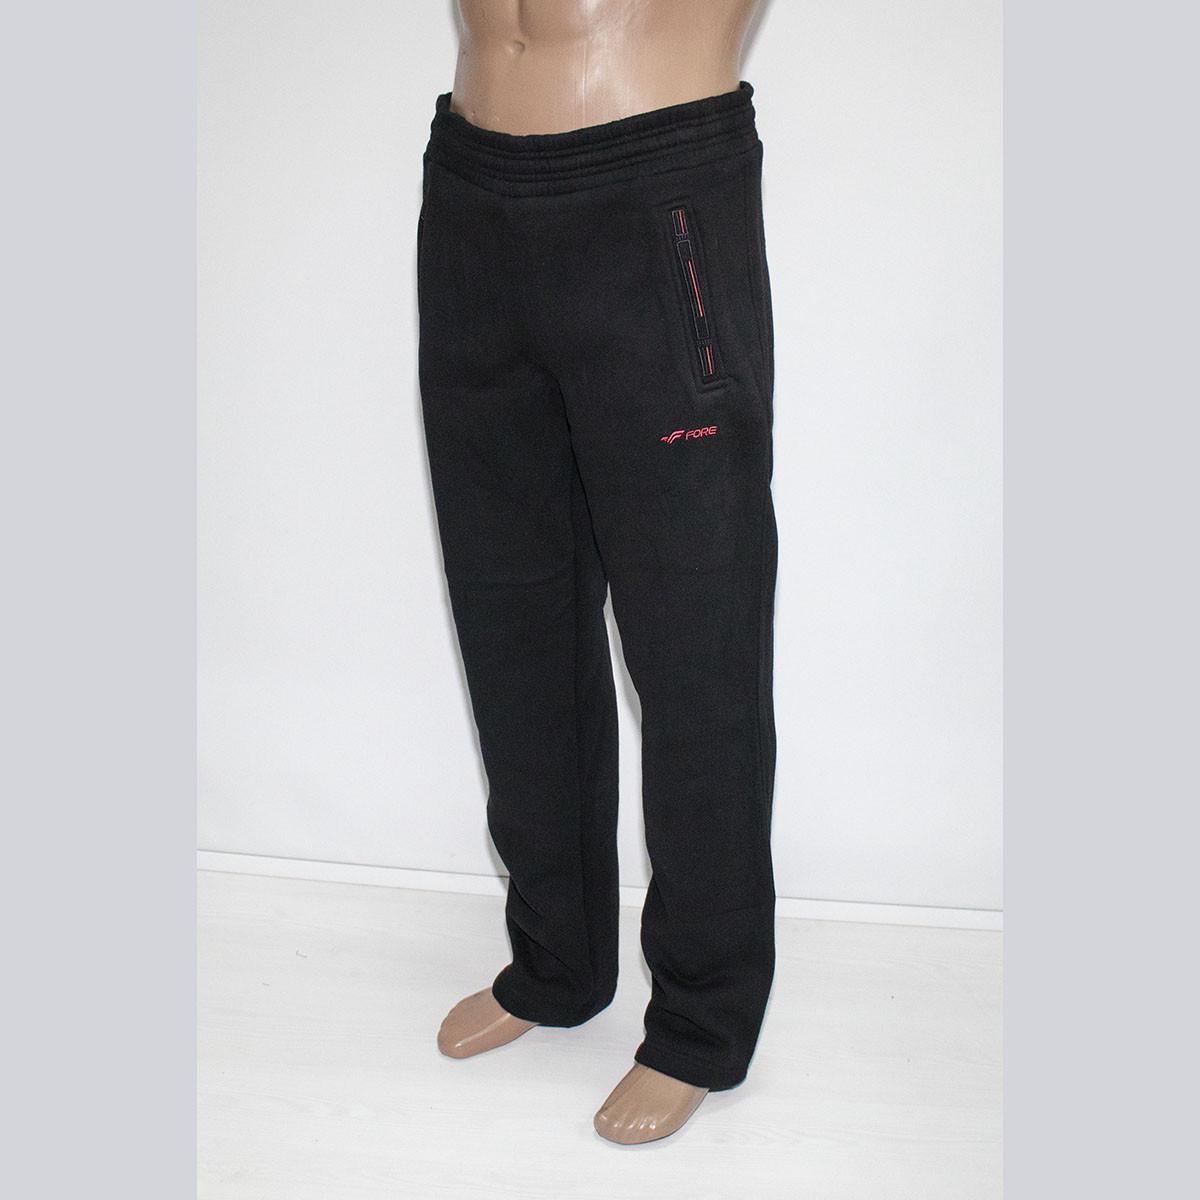 Зимние спортивные штаны на мужчин трехнитка фабрика Турция тм. FORE 1148